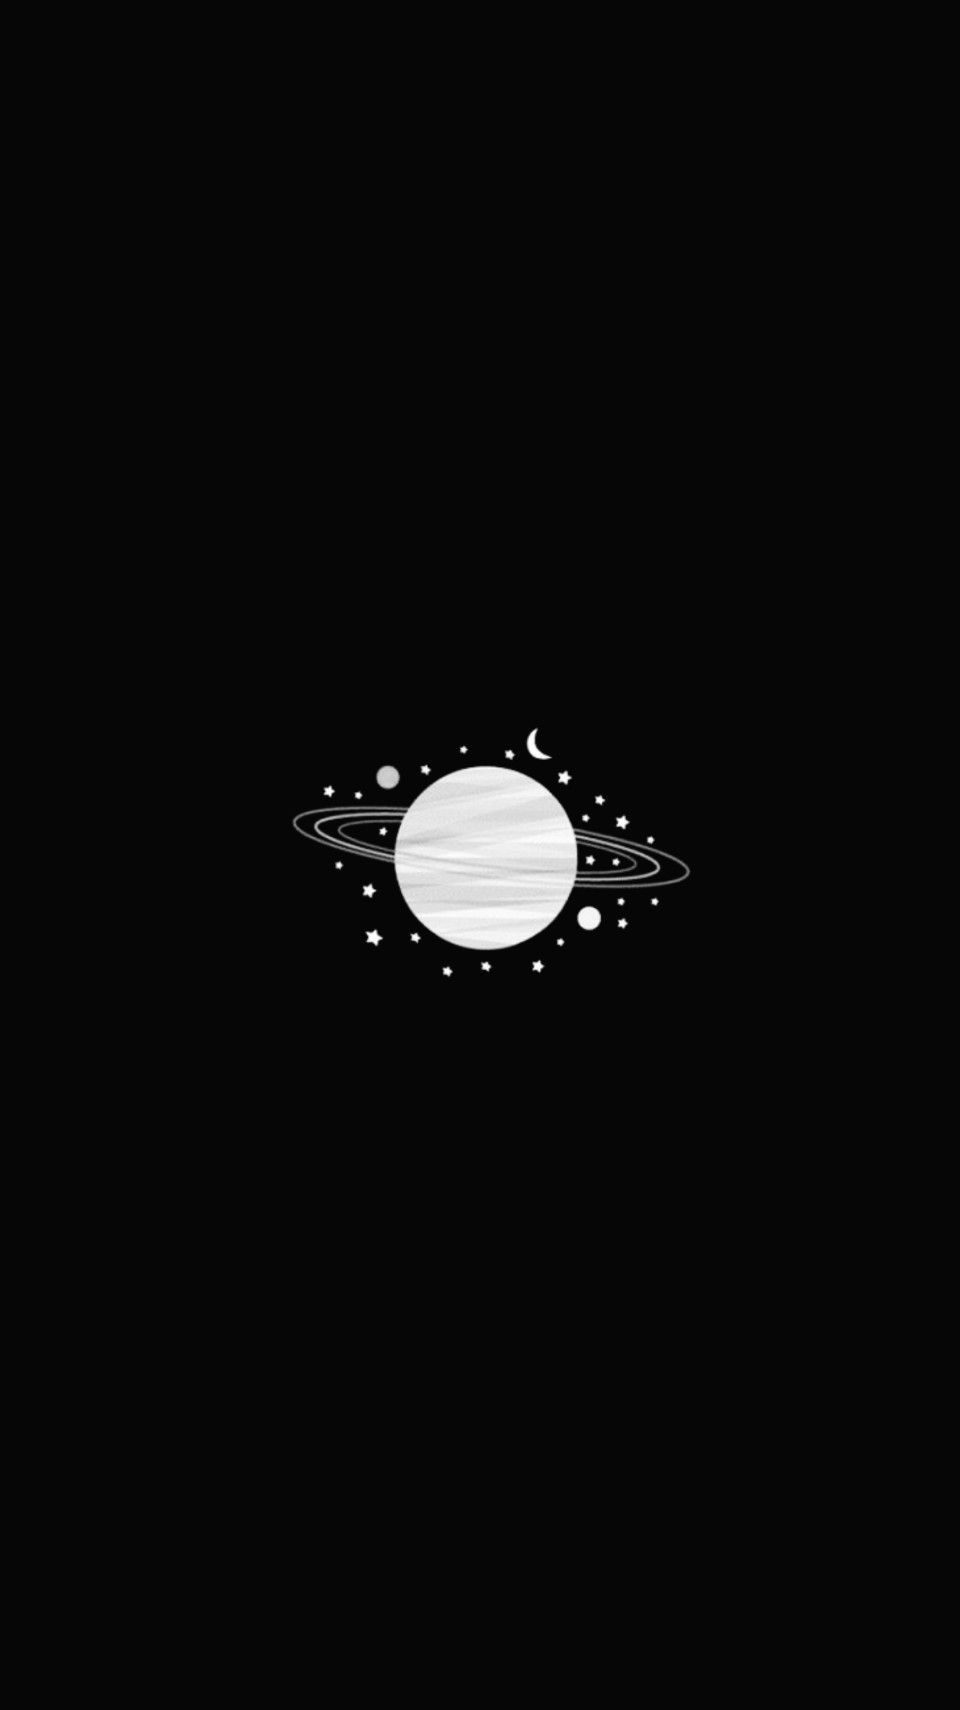 Pin Oleh Jess Di Wallpaper Layar Hitam Lukisan Galaksi Wallpaper Ponsel